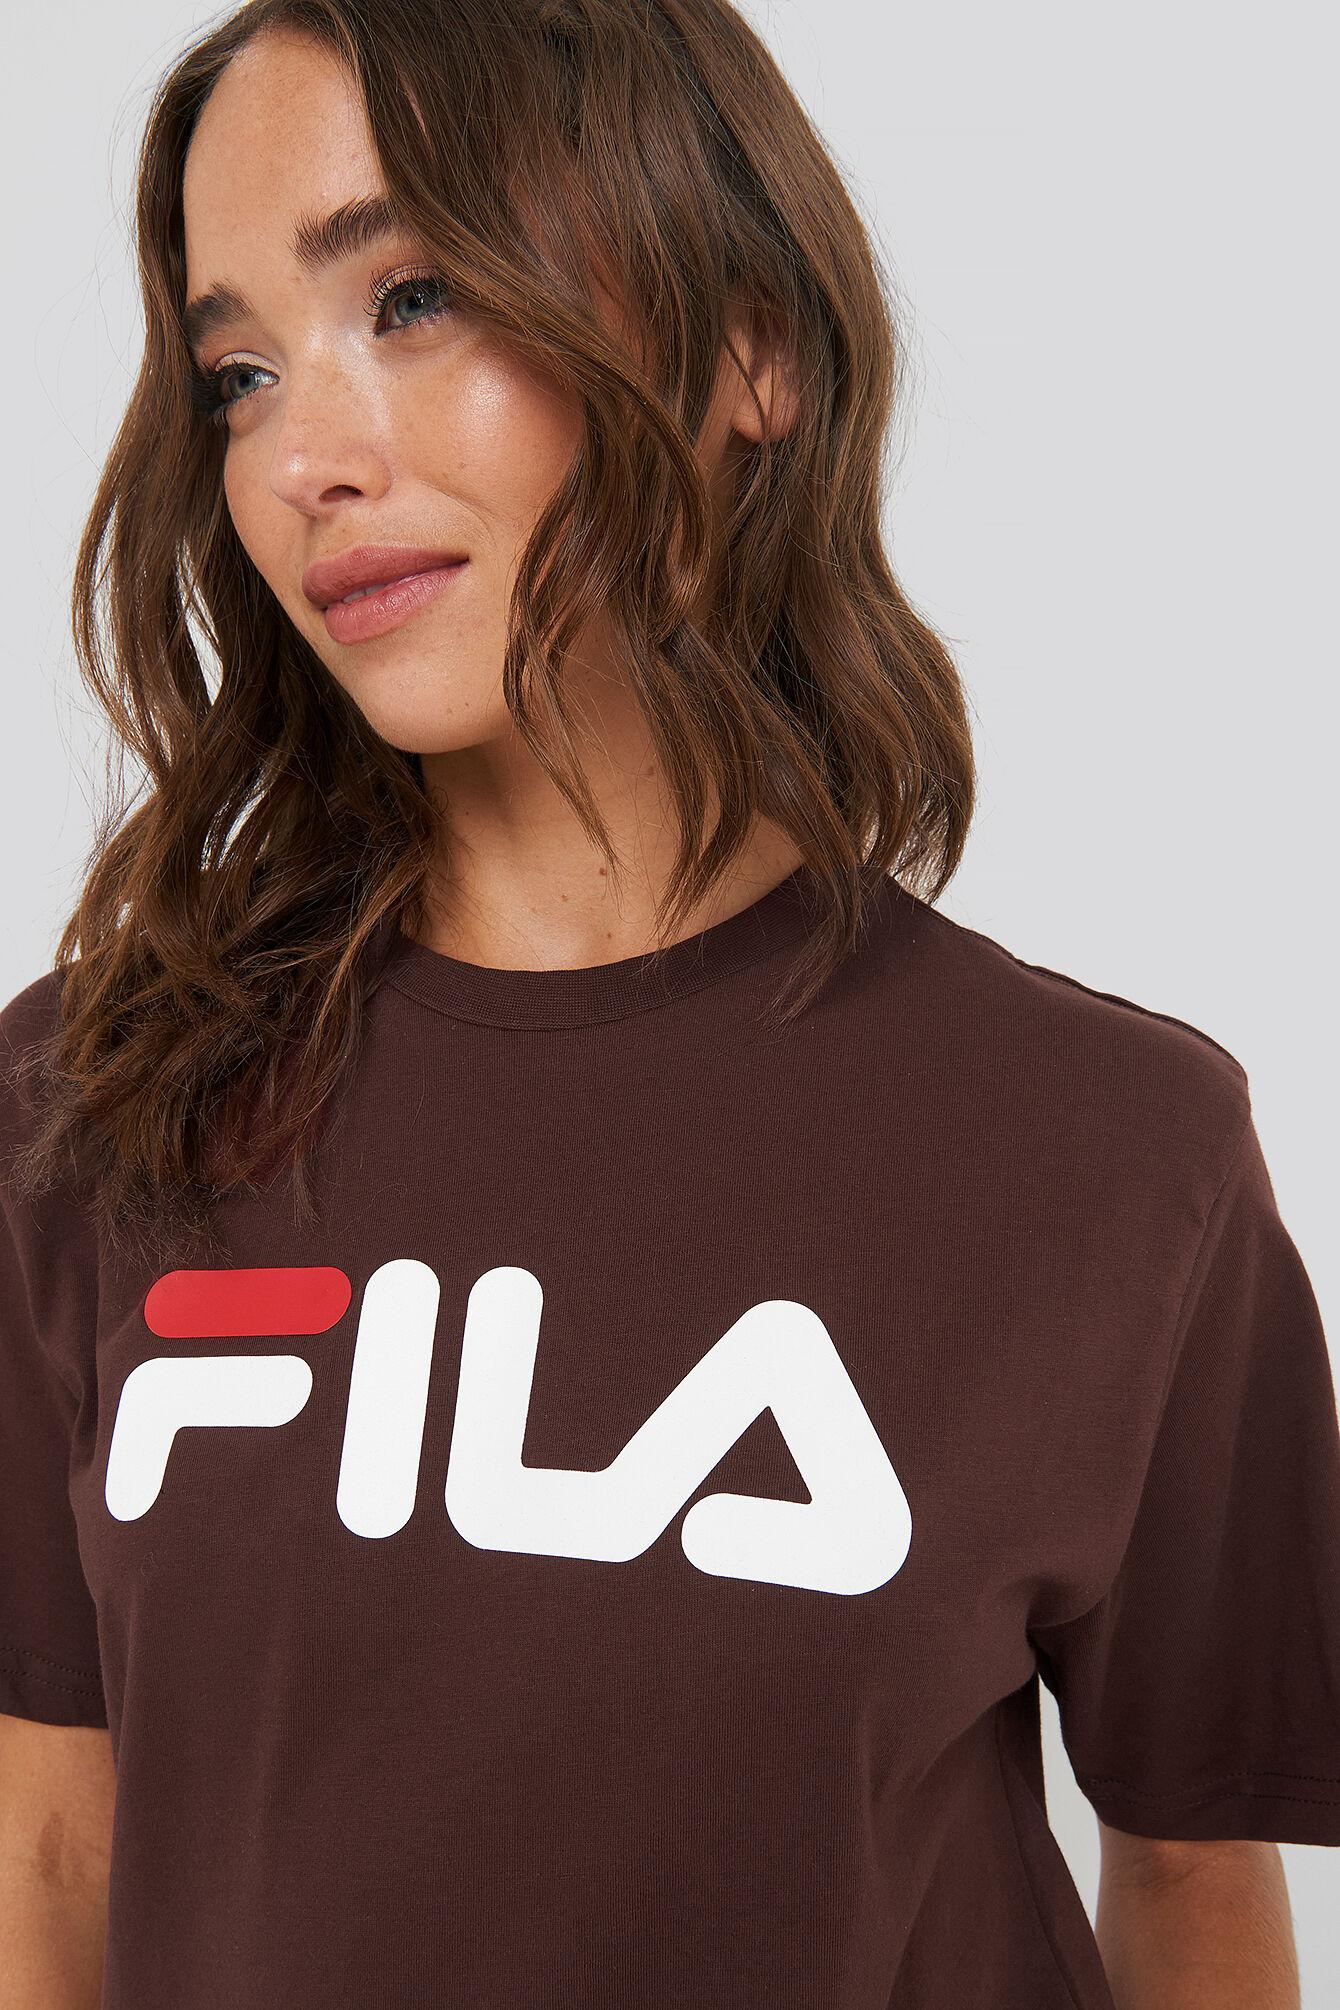 FILA Classic Pure Tee - Brown